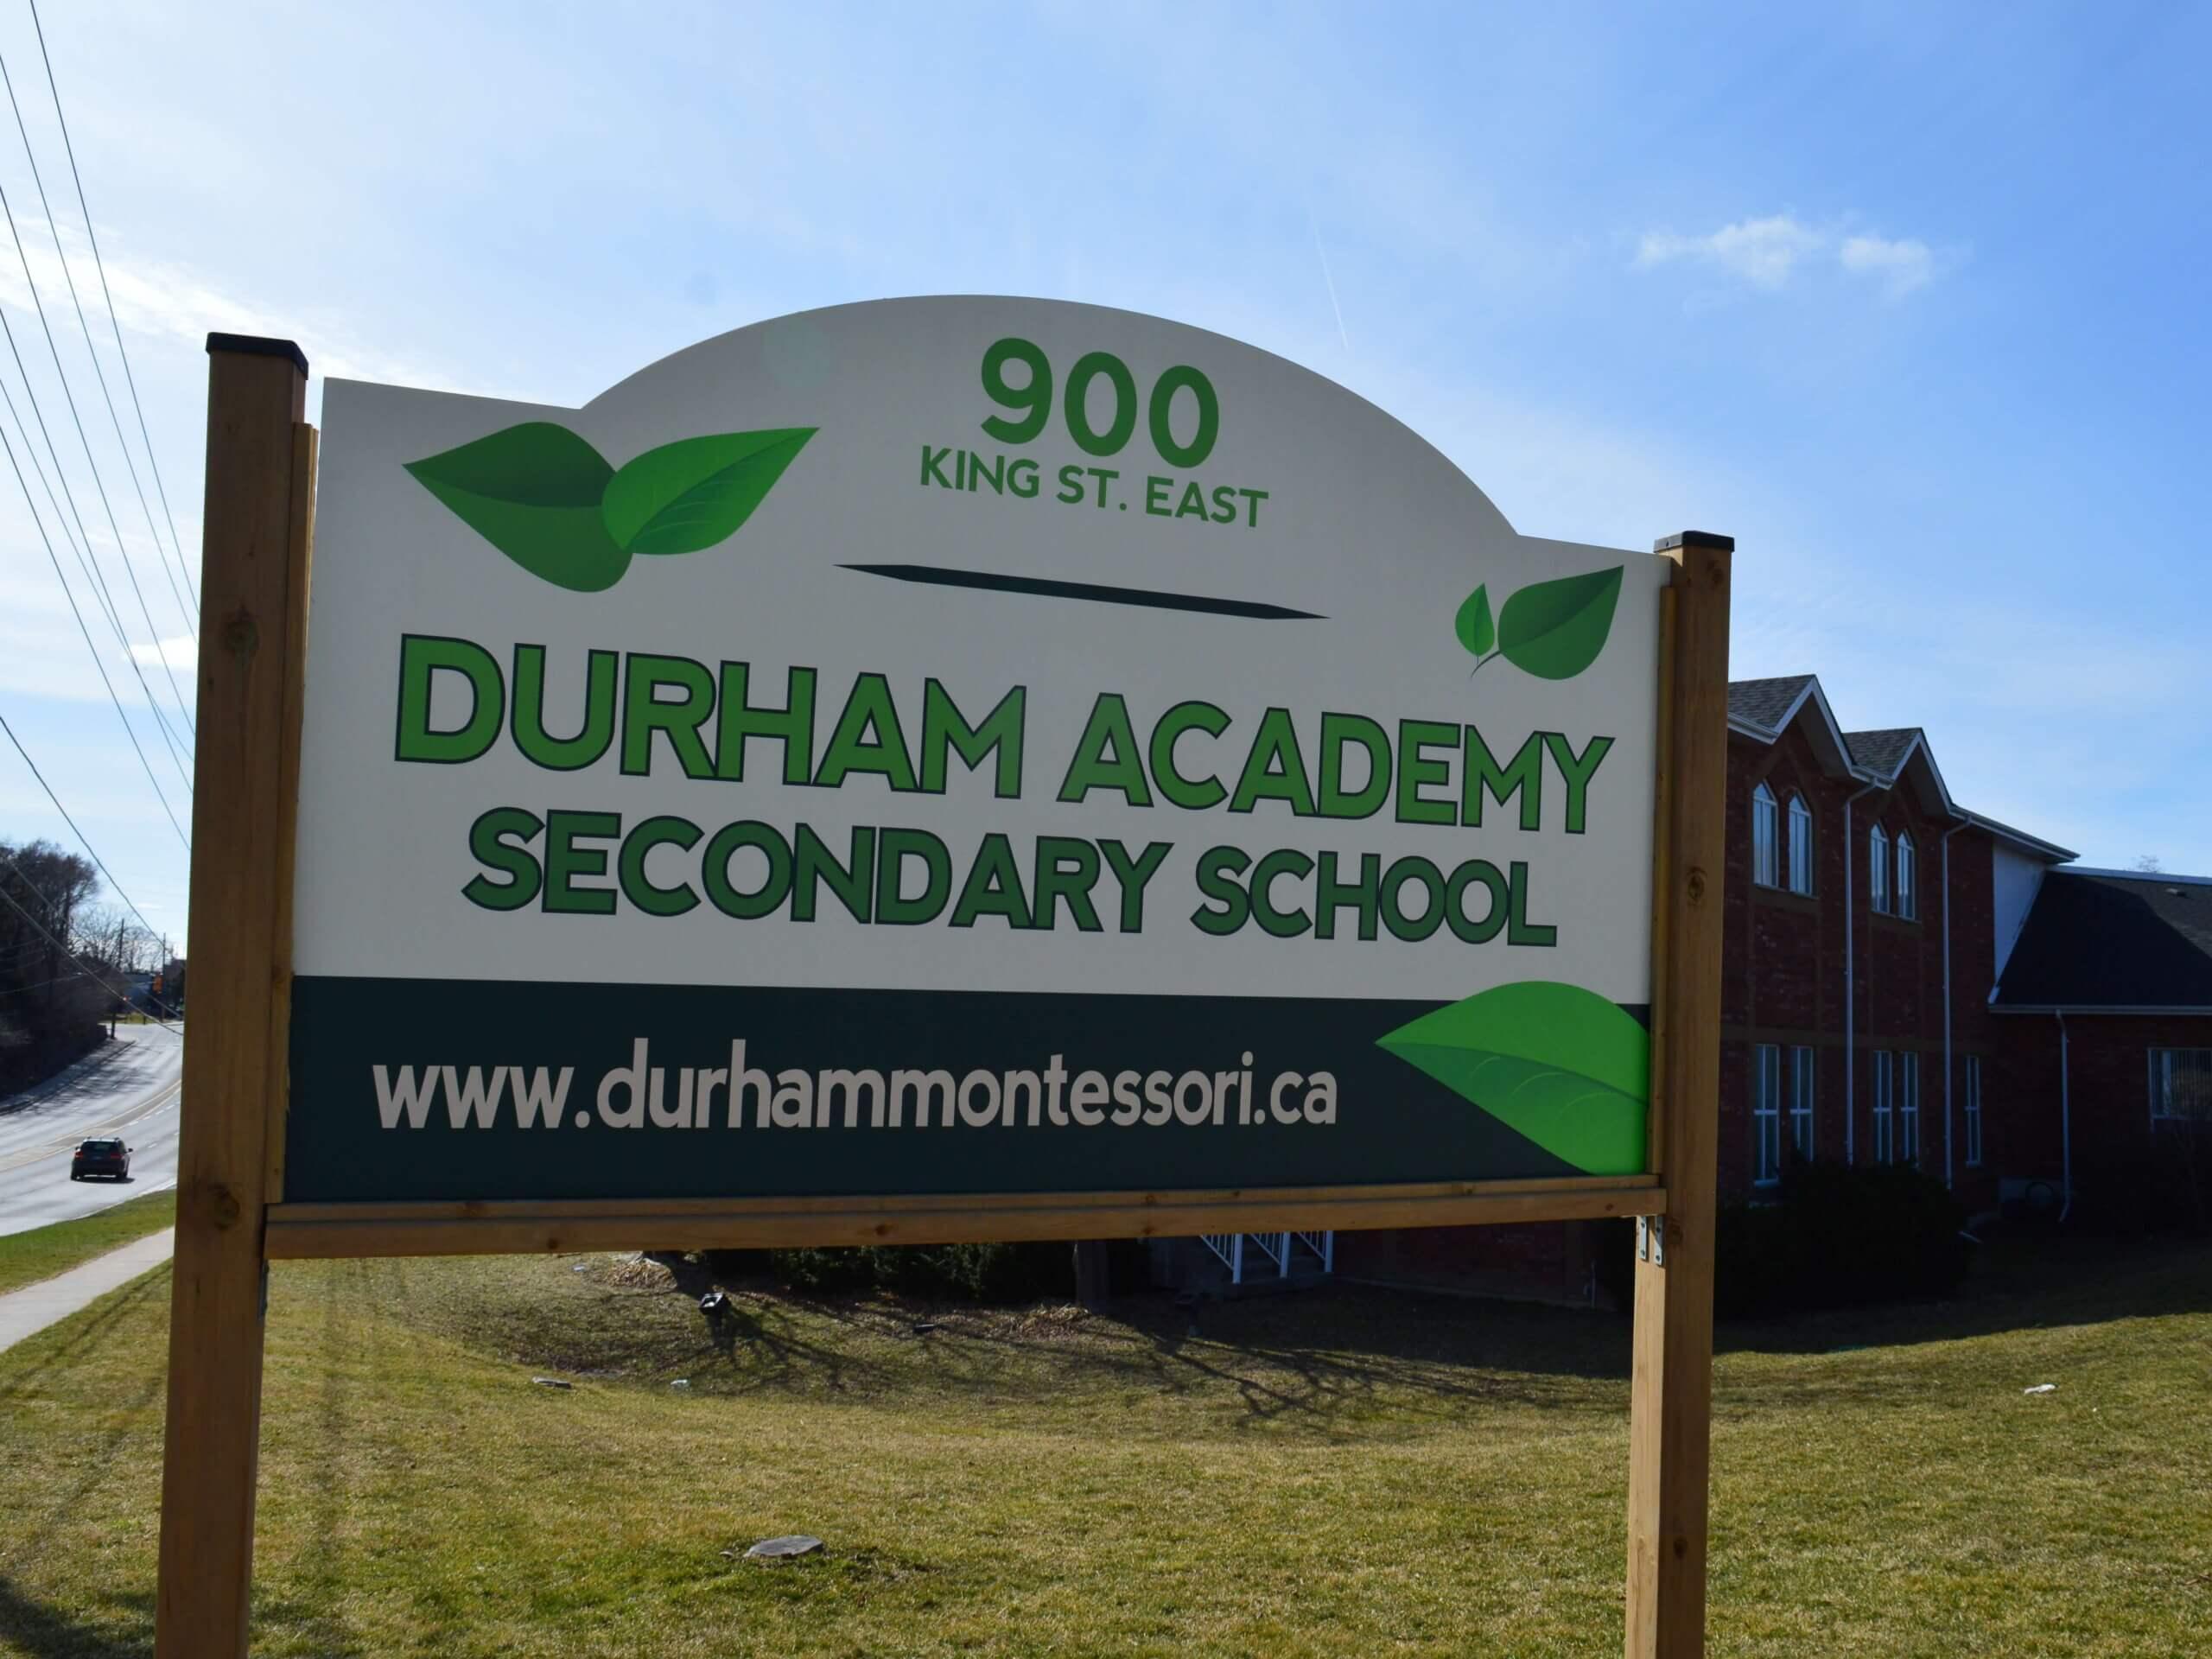 Durham Academy Secondary School